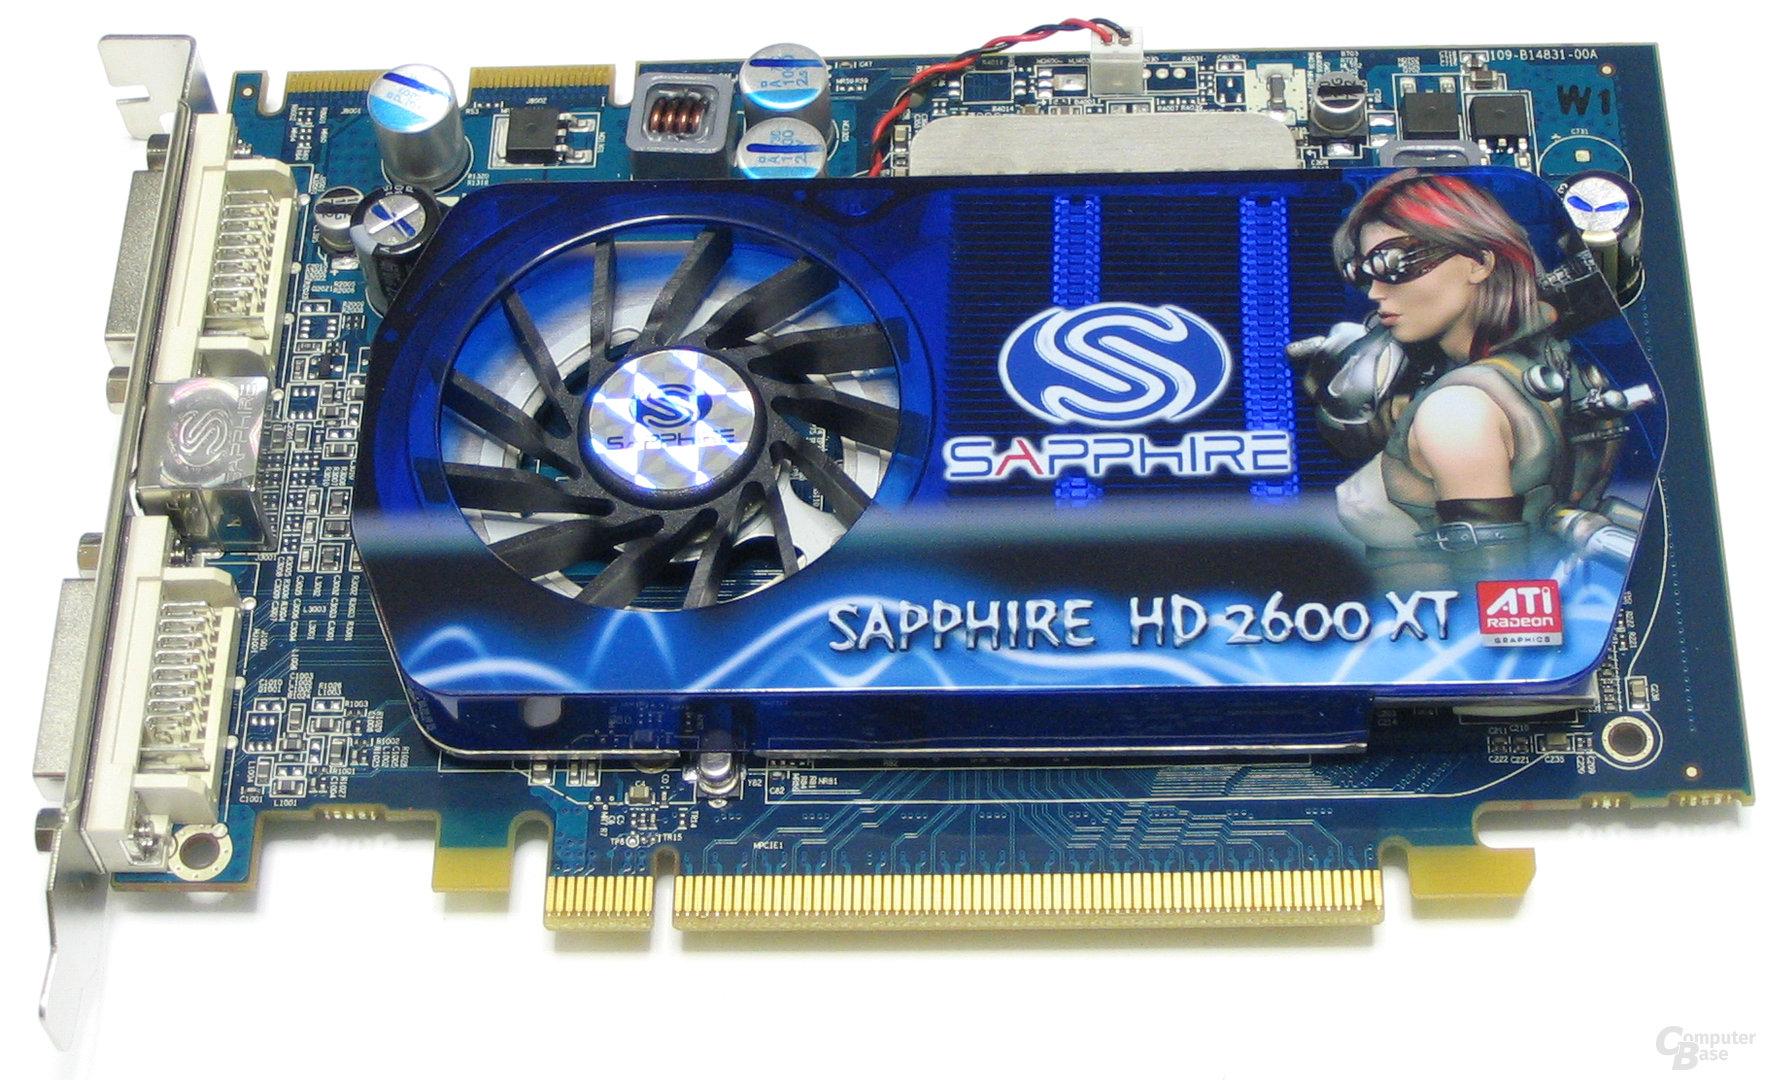 Sapphire Radeon HD 2600 XT